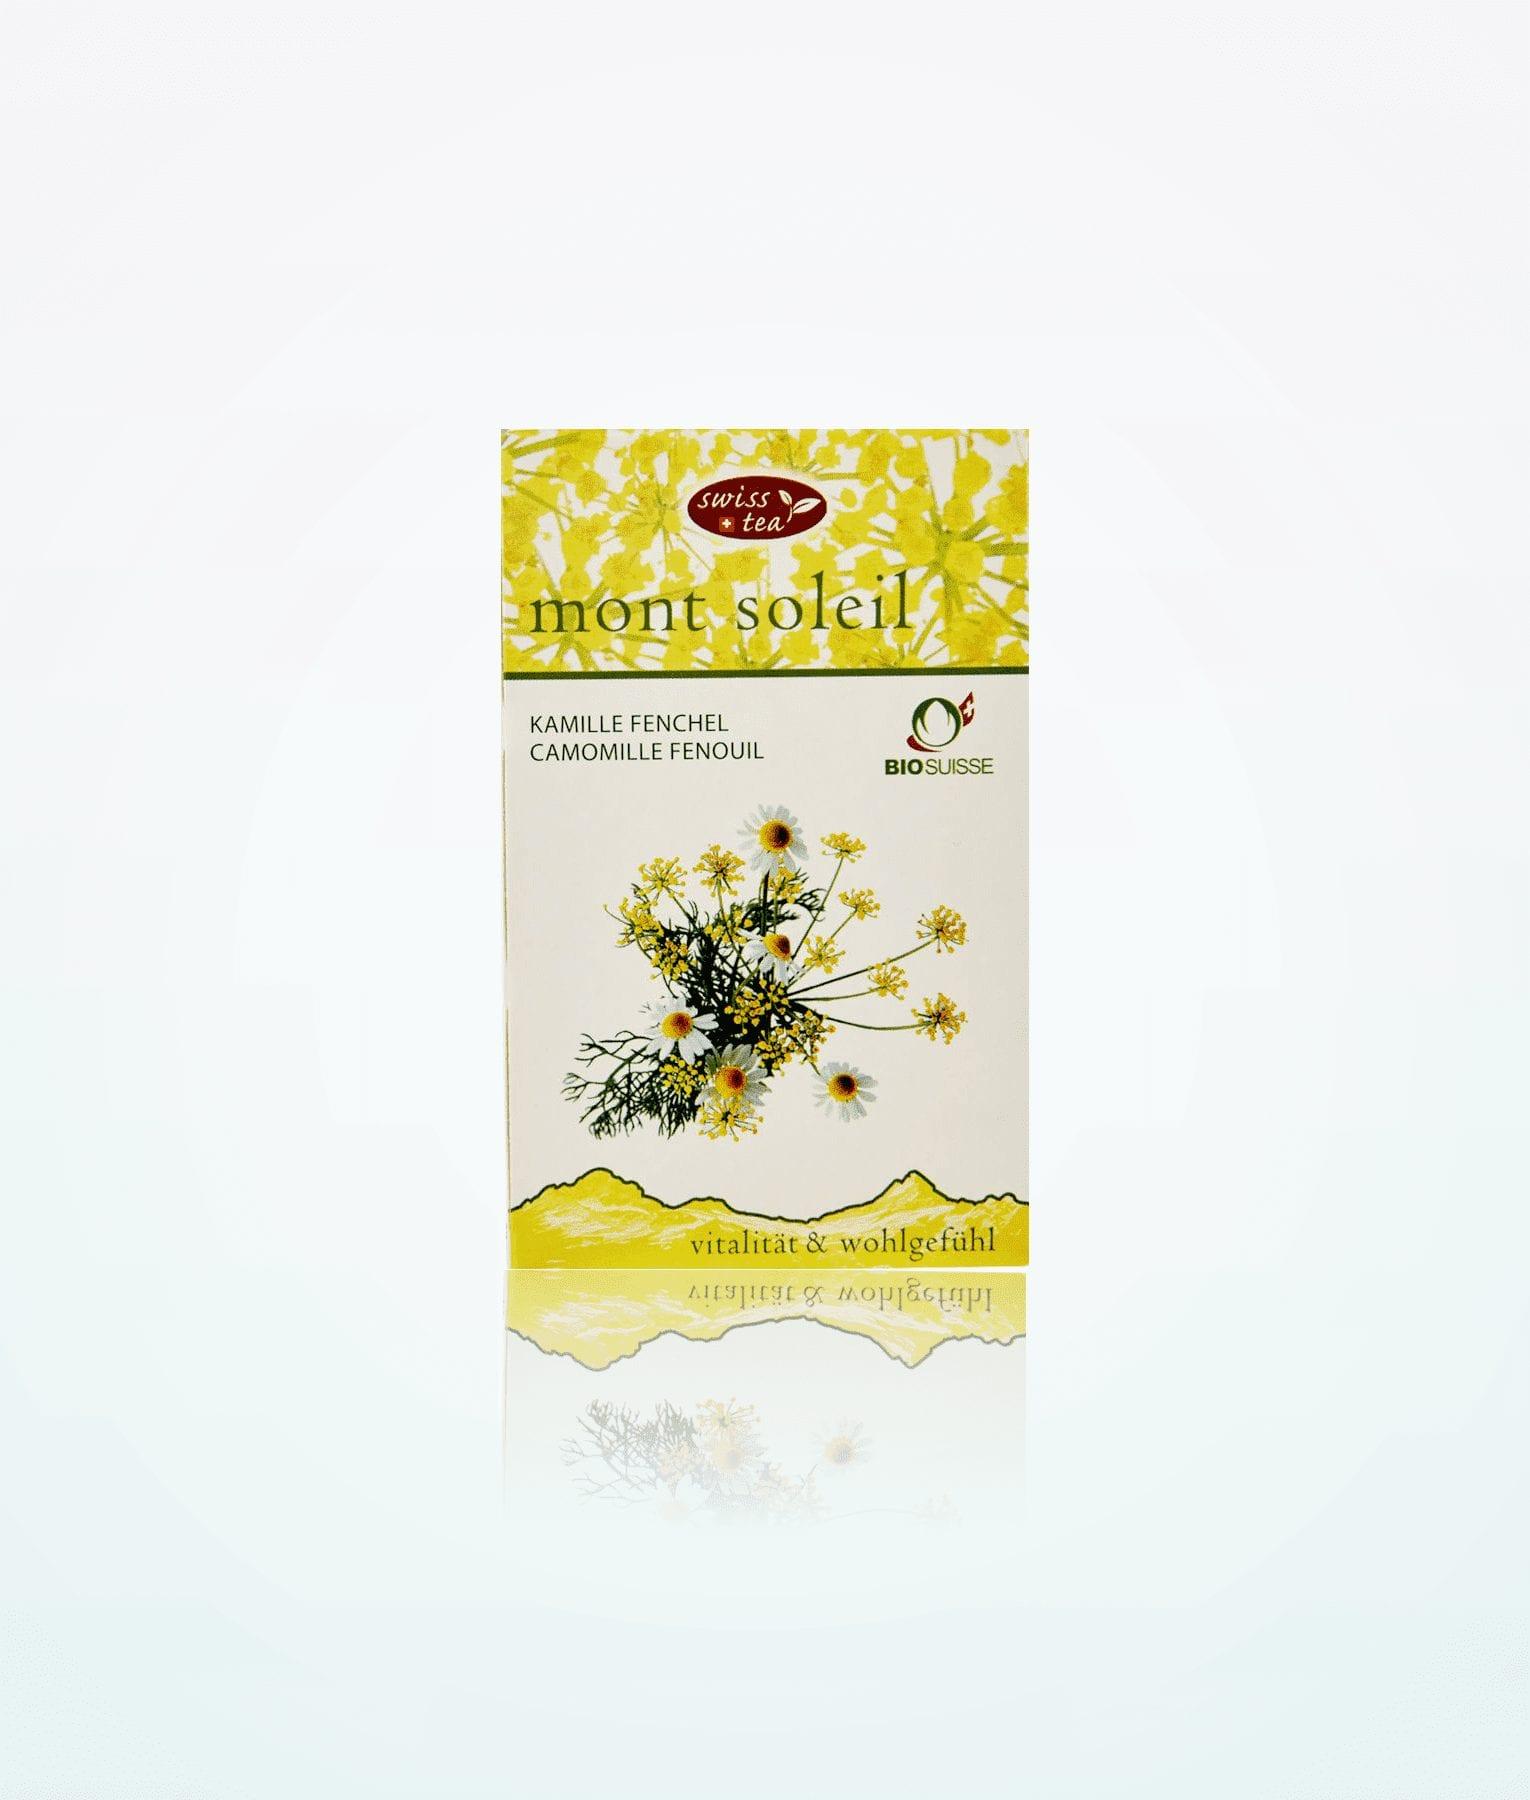 swisstea-organic-mont-soilel-tea